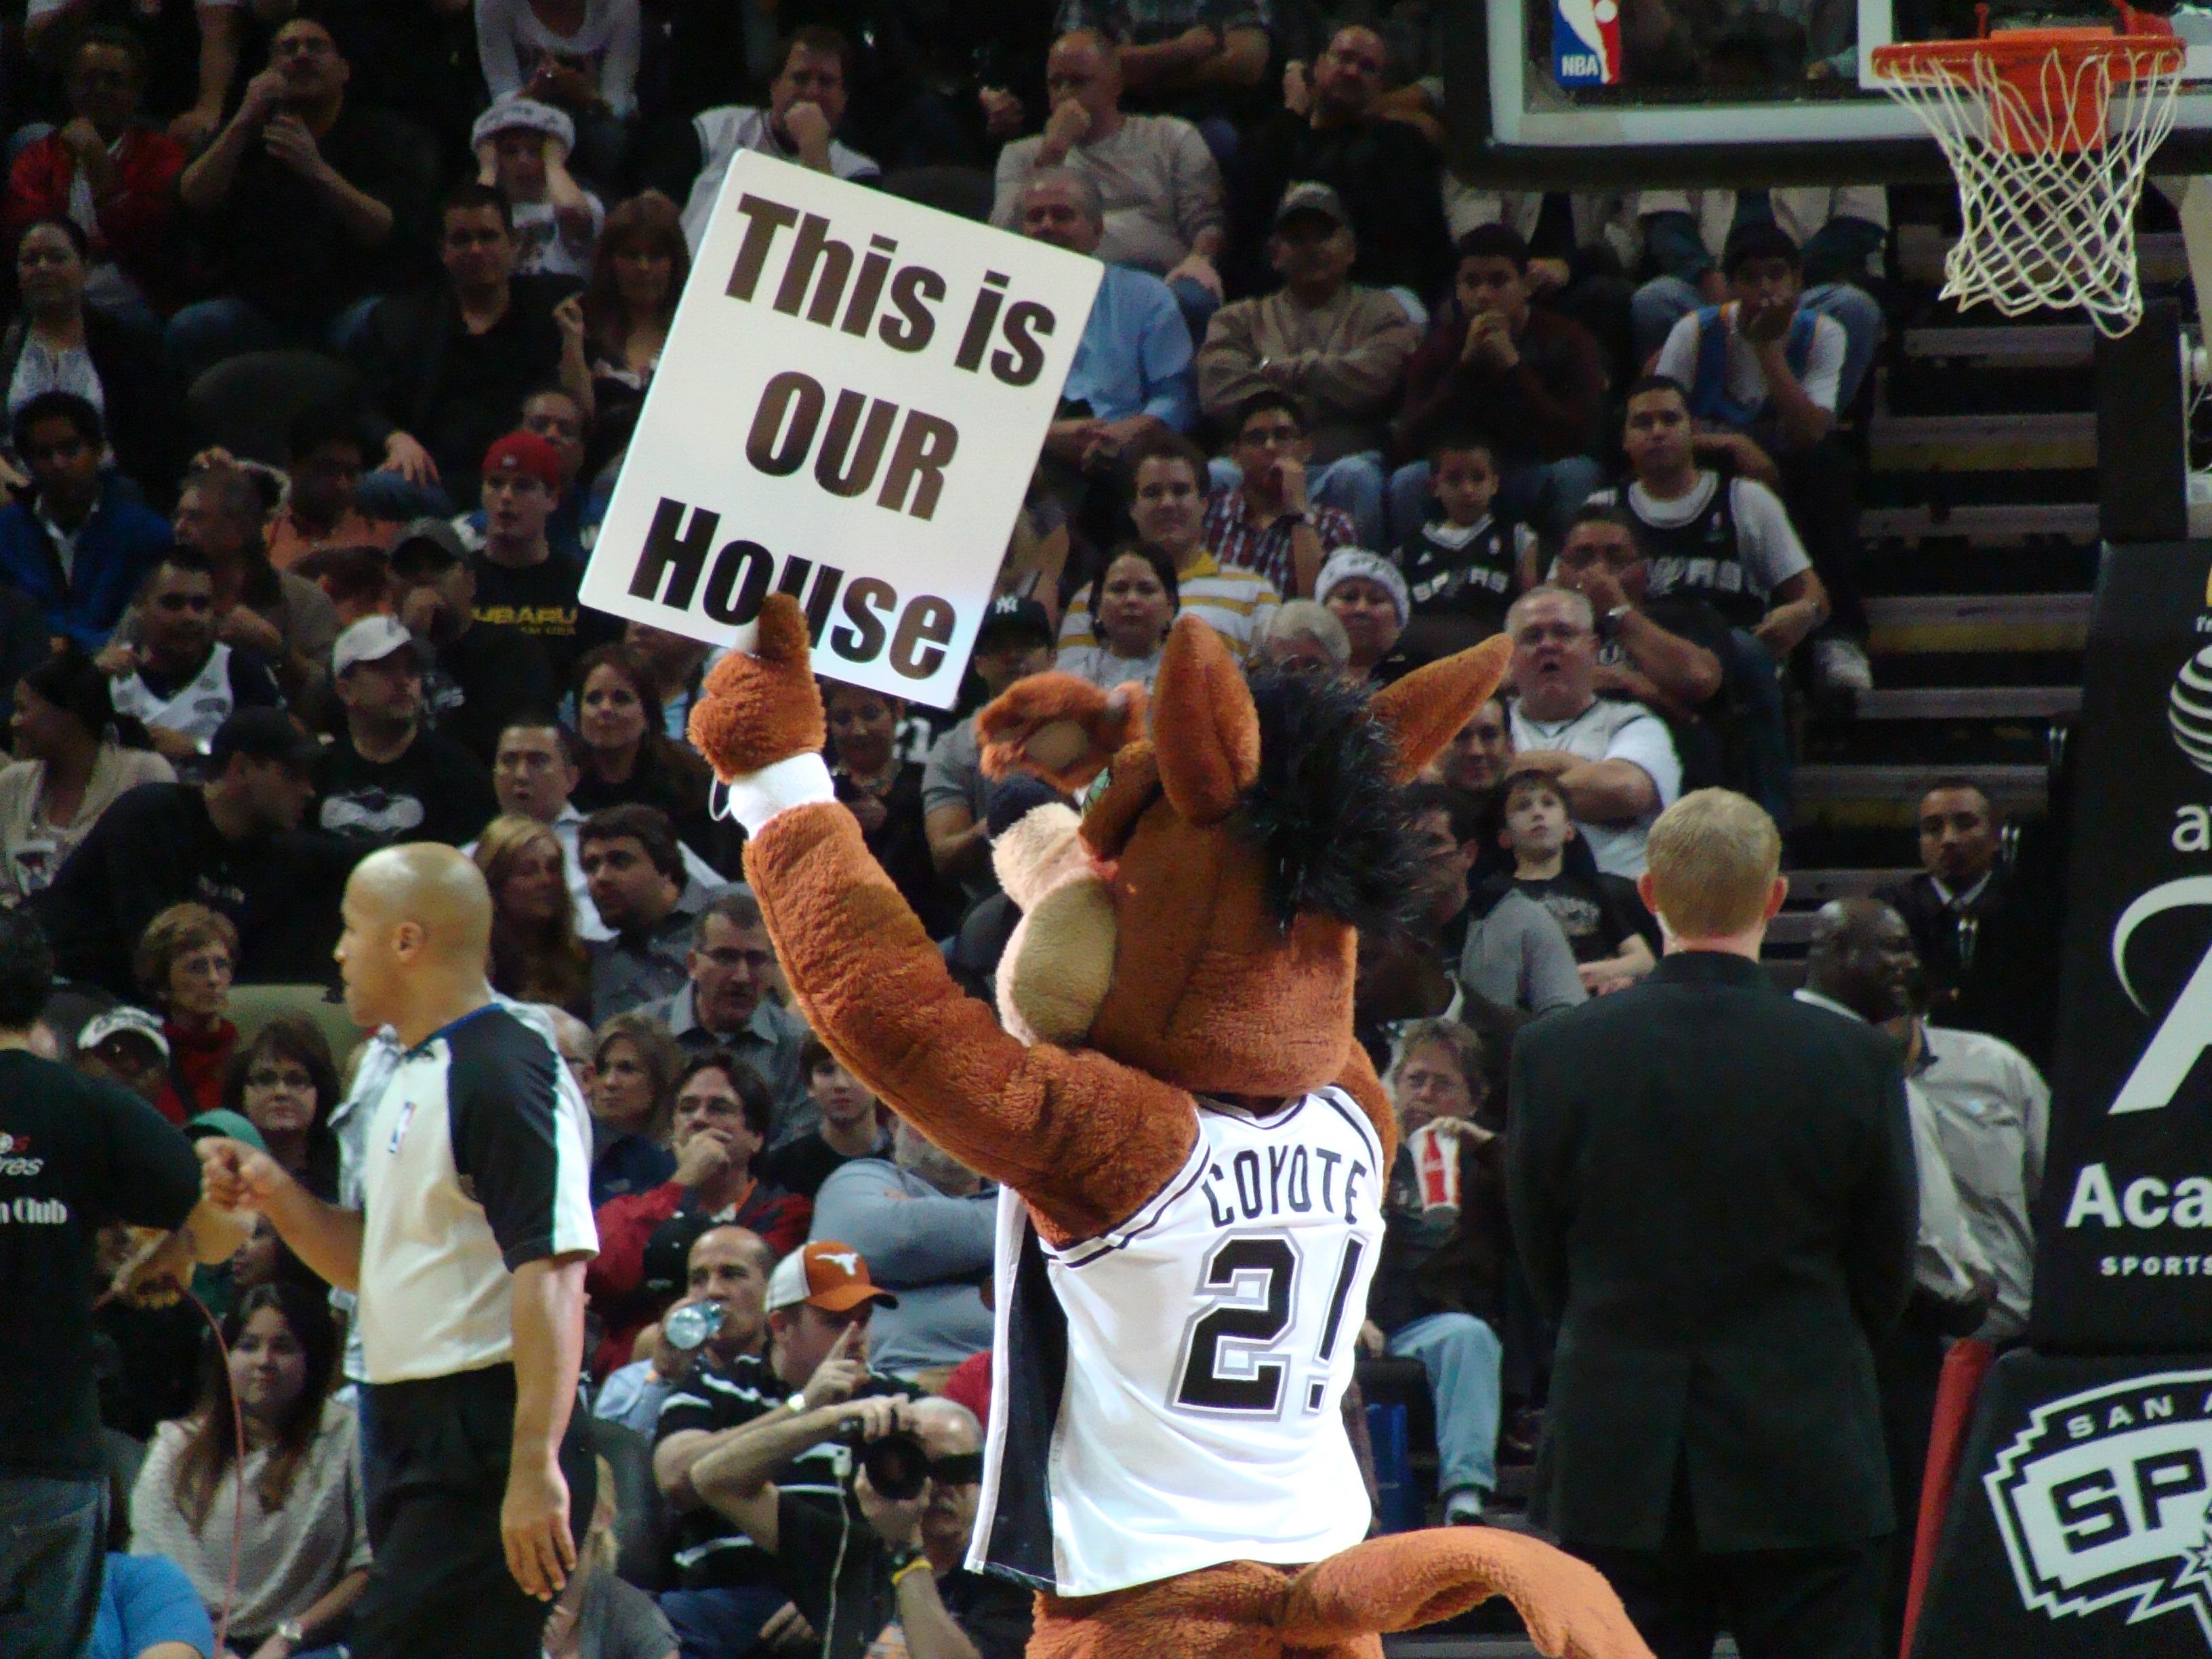 The Coyote Mascot Wikipedia